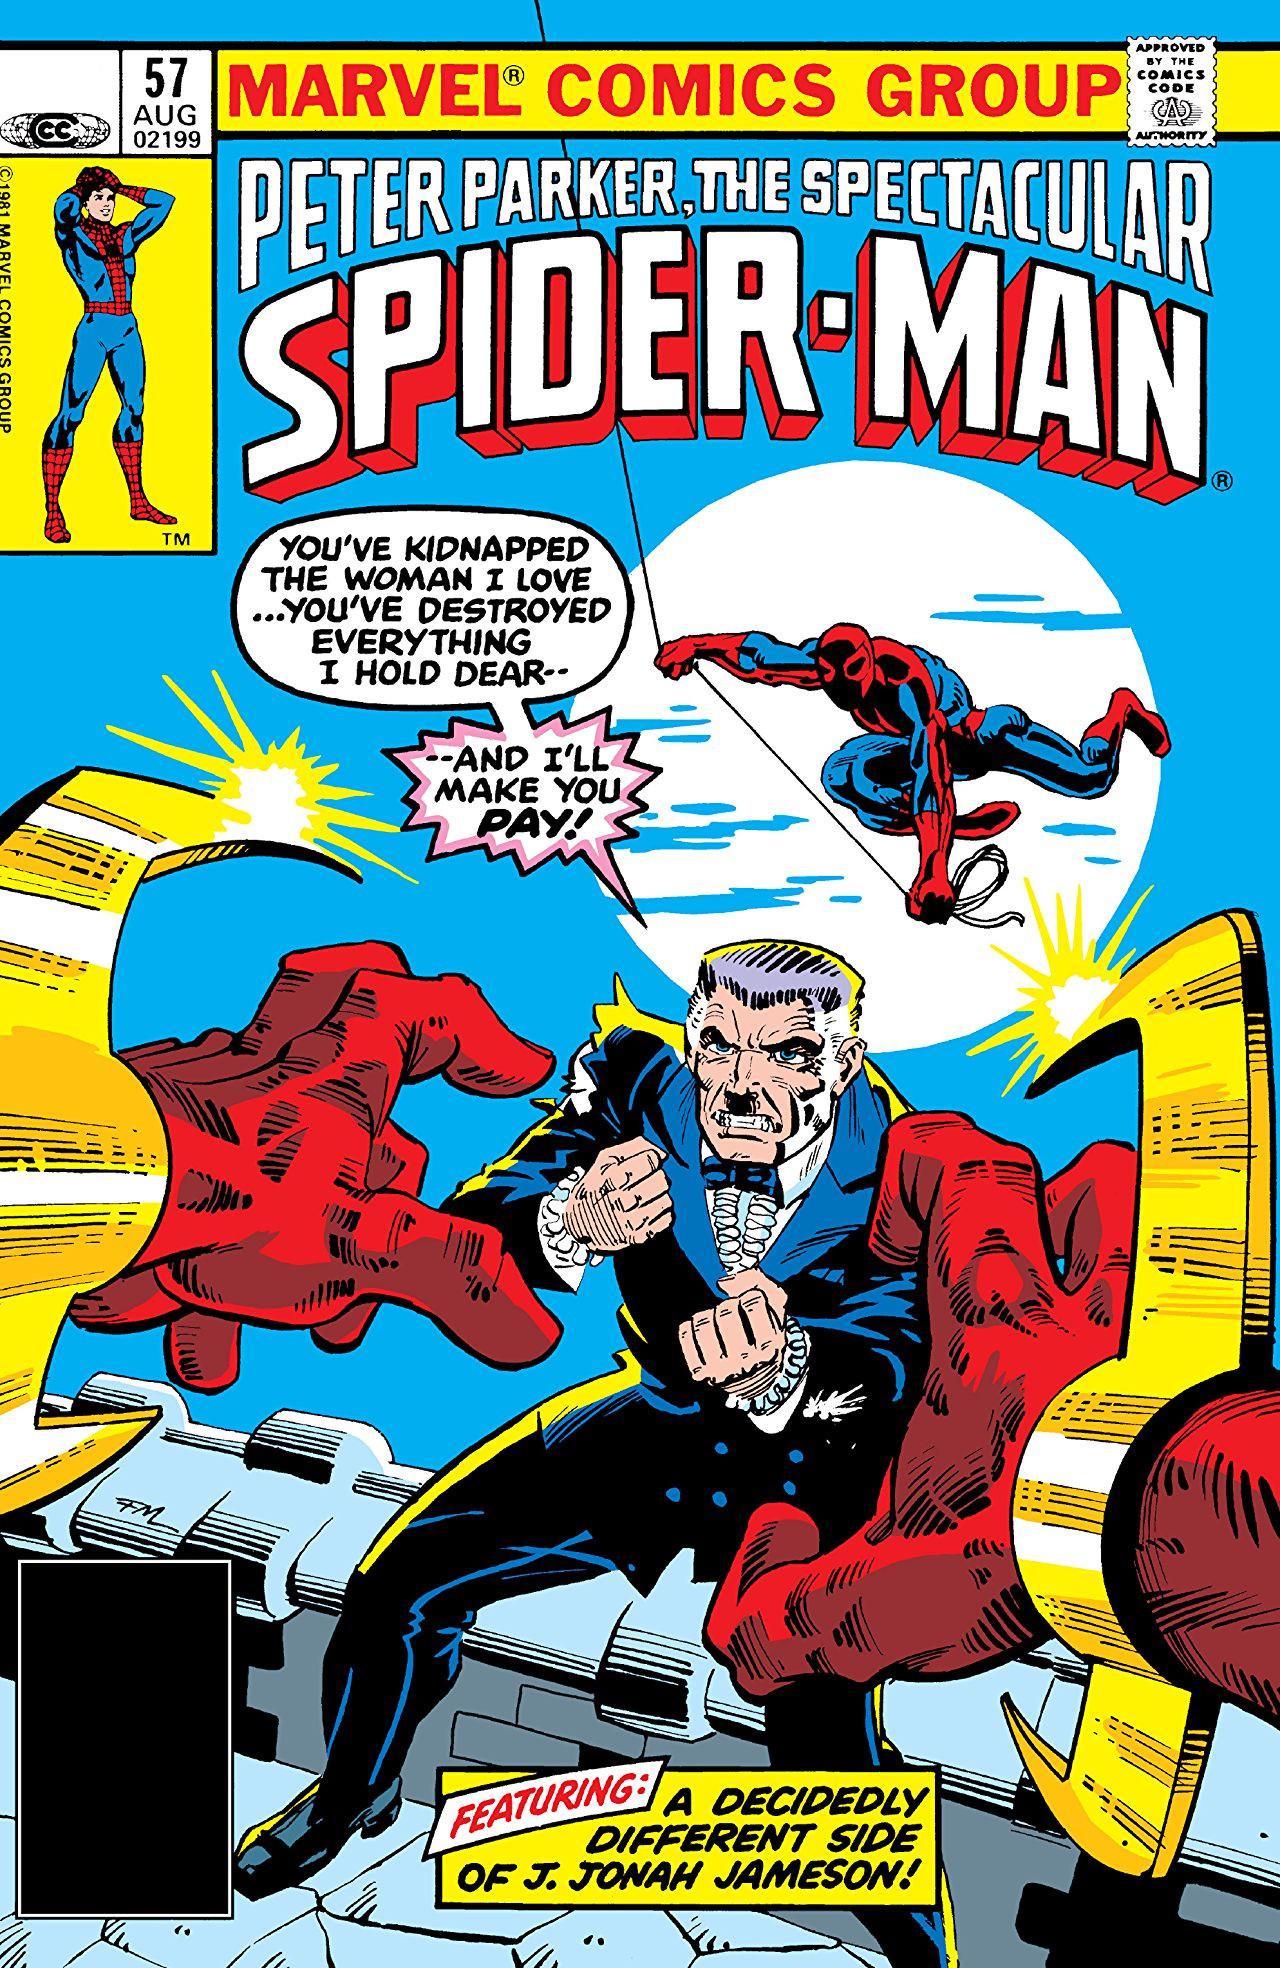 Peter Parker, The Spectacular Spider-Man Vol 1 57